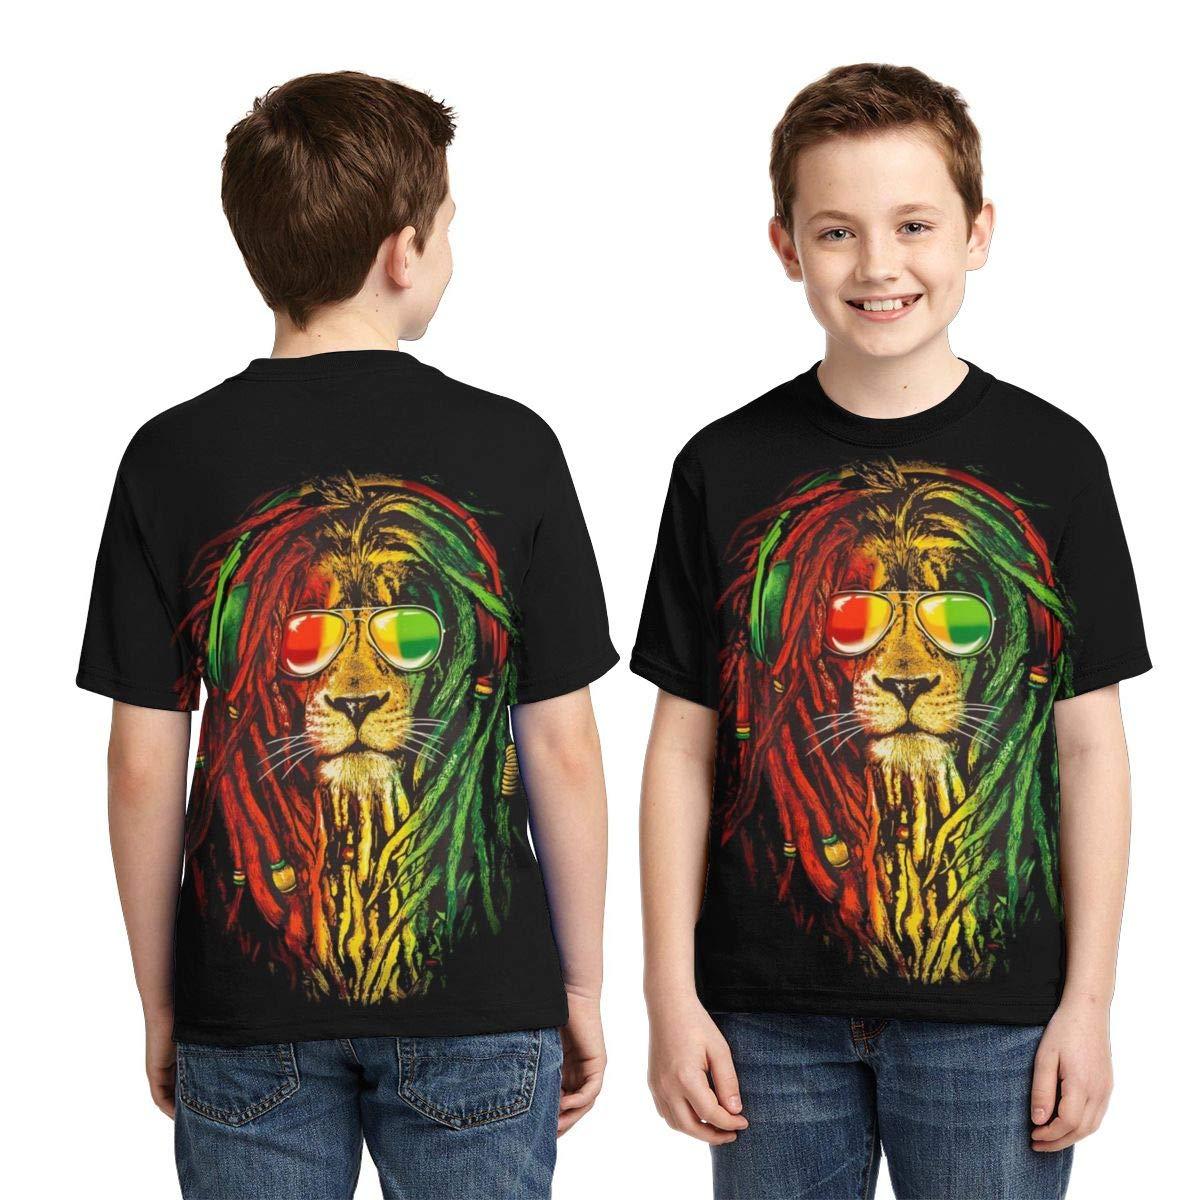 Traci StoneN Kid//Youth Rasta Lion T-Shirts 3D Print Short Sleeve Graphics Tees for Boys